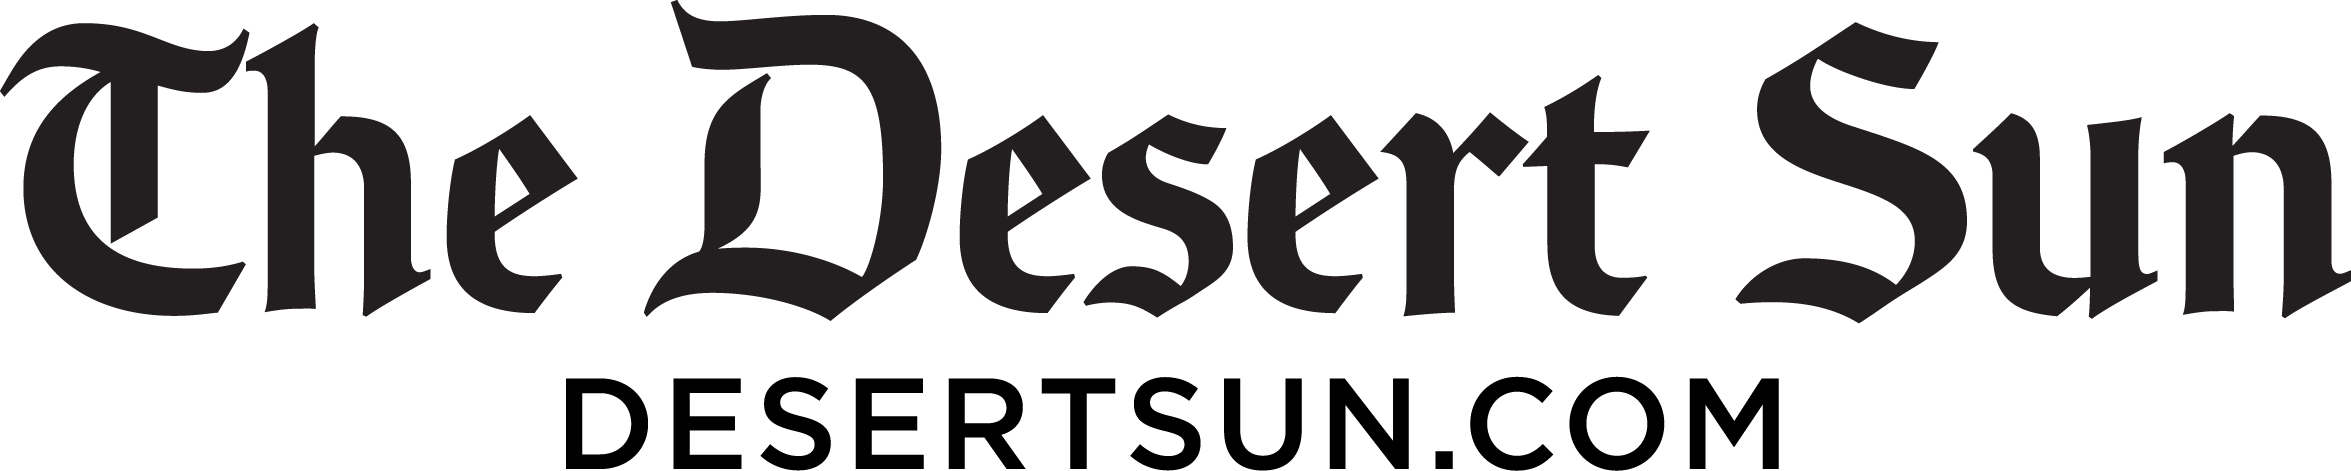 desertsundotcom_logo_black